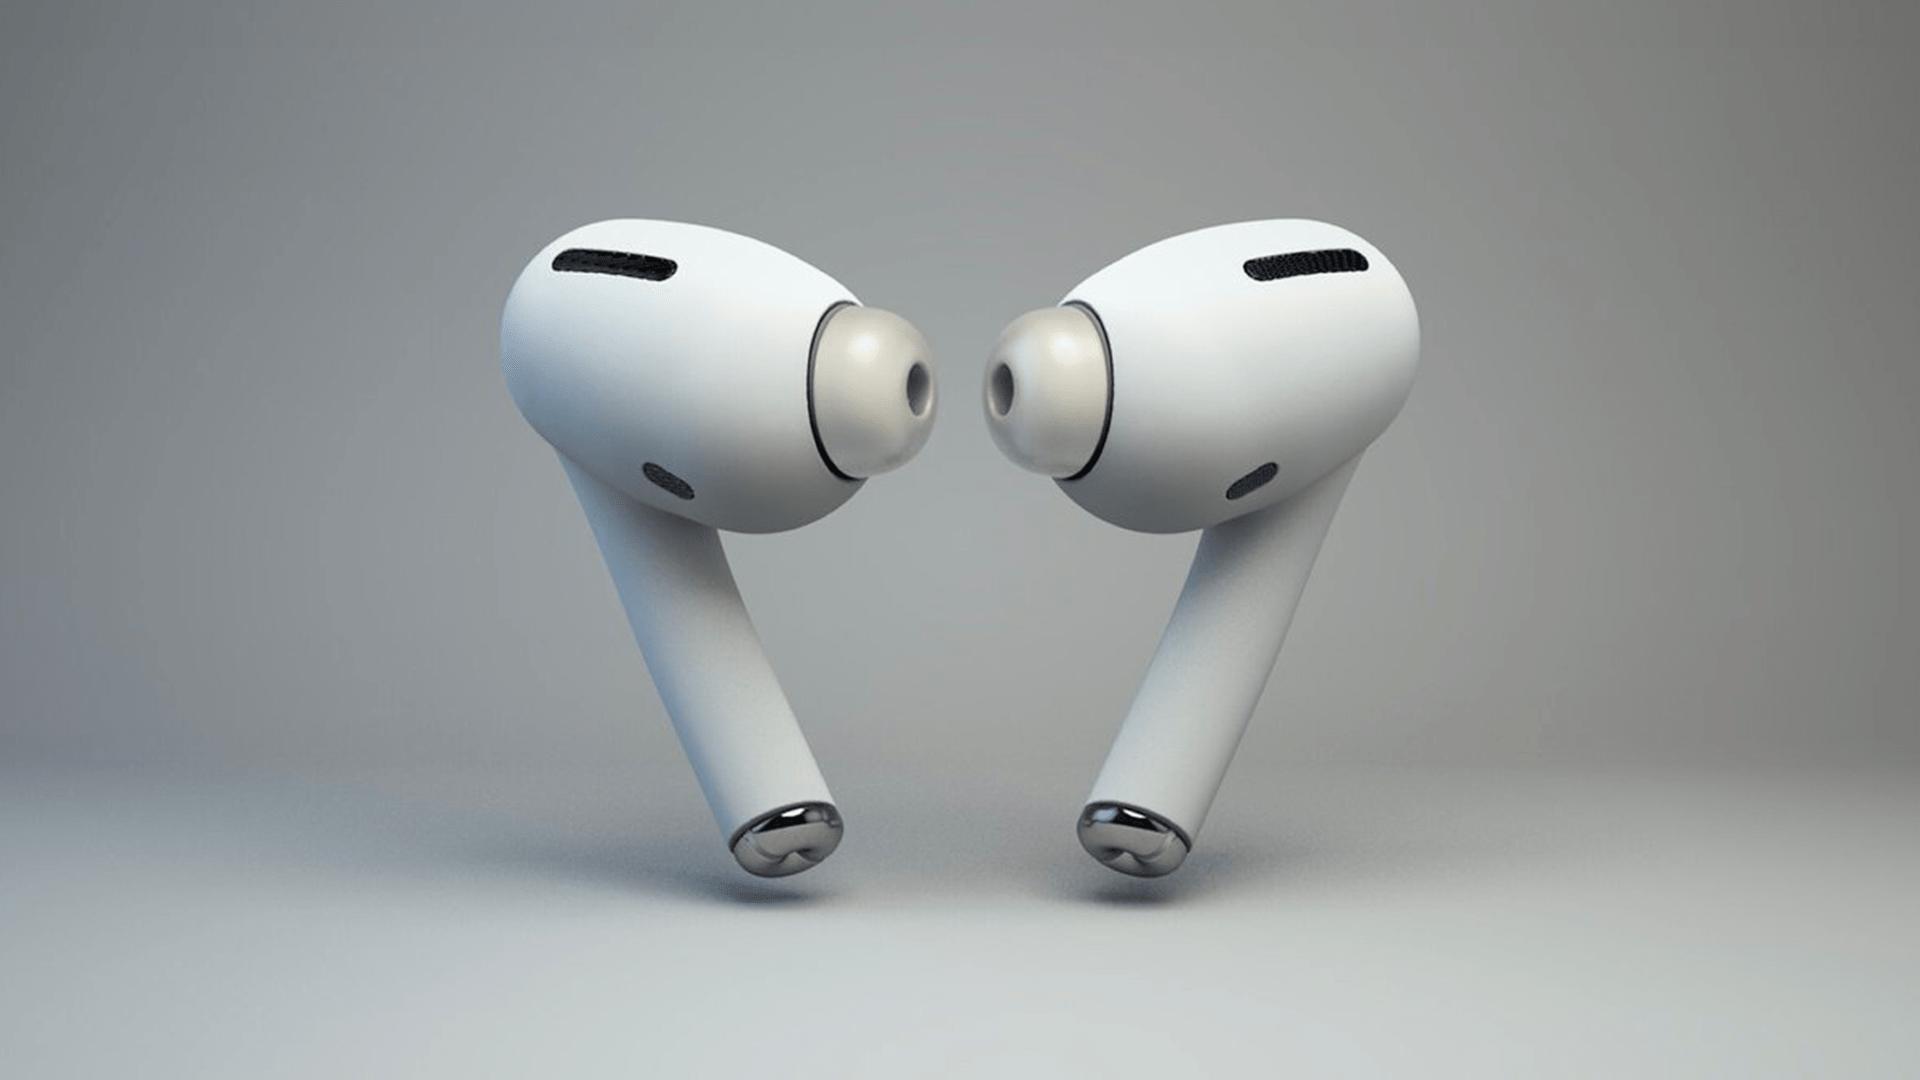 Airpods konsept